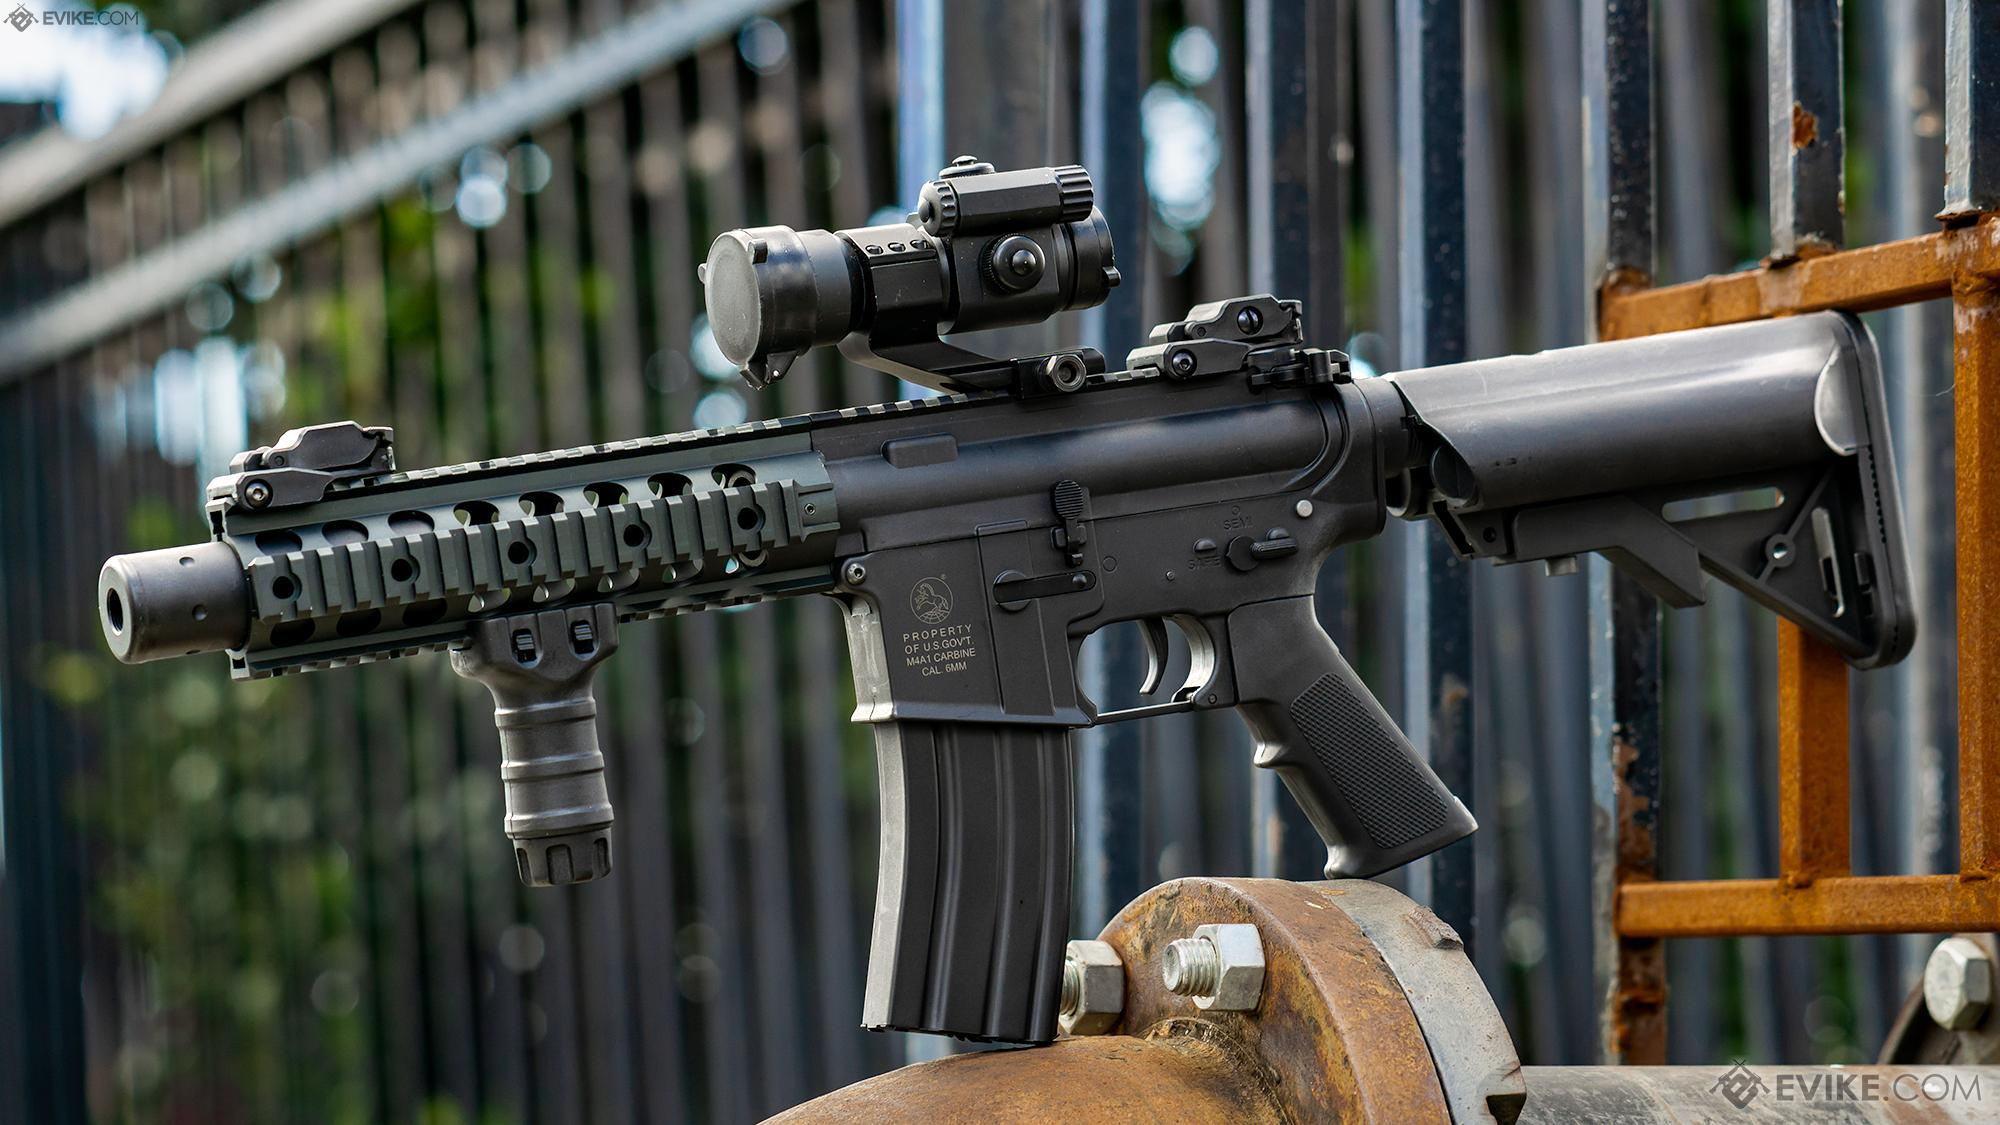 Colt Licensed Sportsline M4 Aeg By Cybergun Model M4 Sbr W 8 Quadrail Airsoft Guns Airsoft Electric Rifles Evike Com Airsoft Superstore